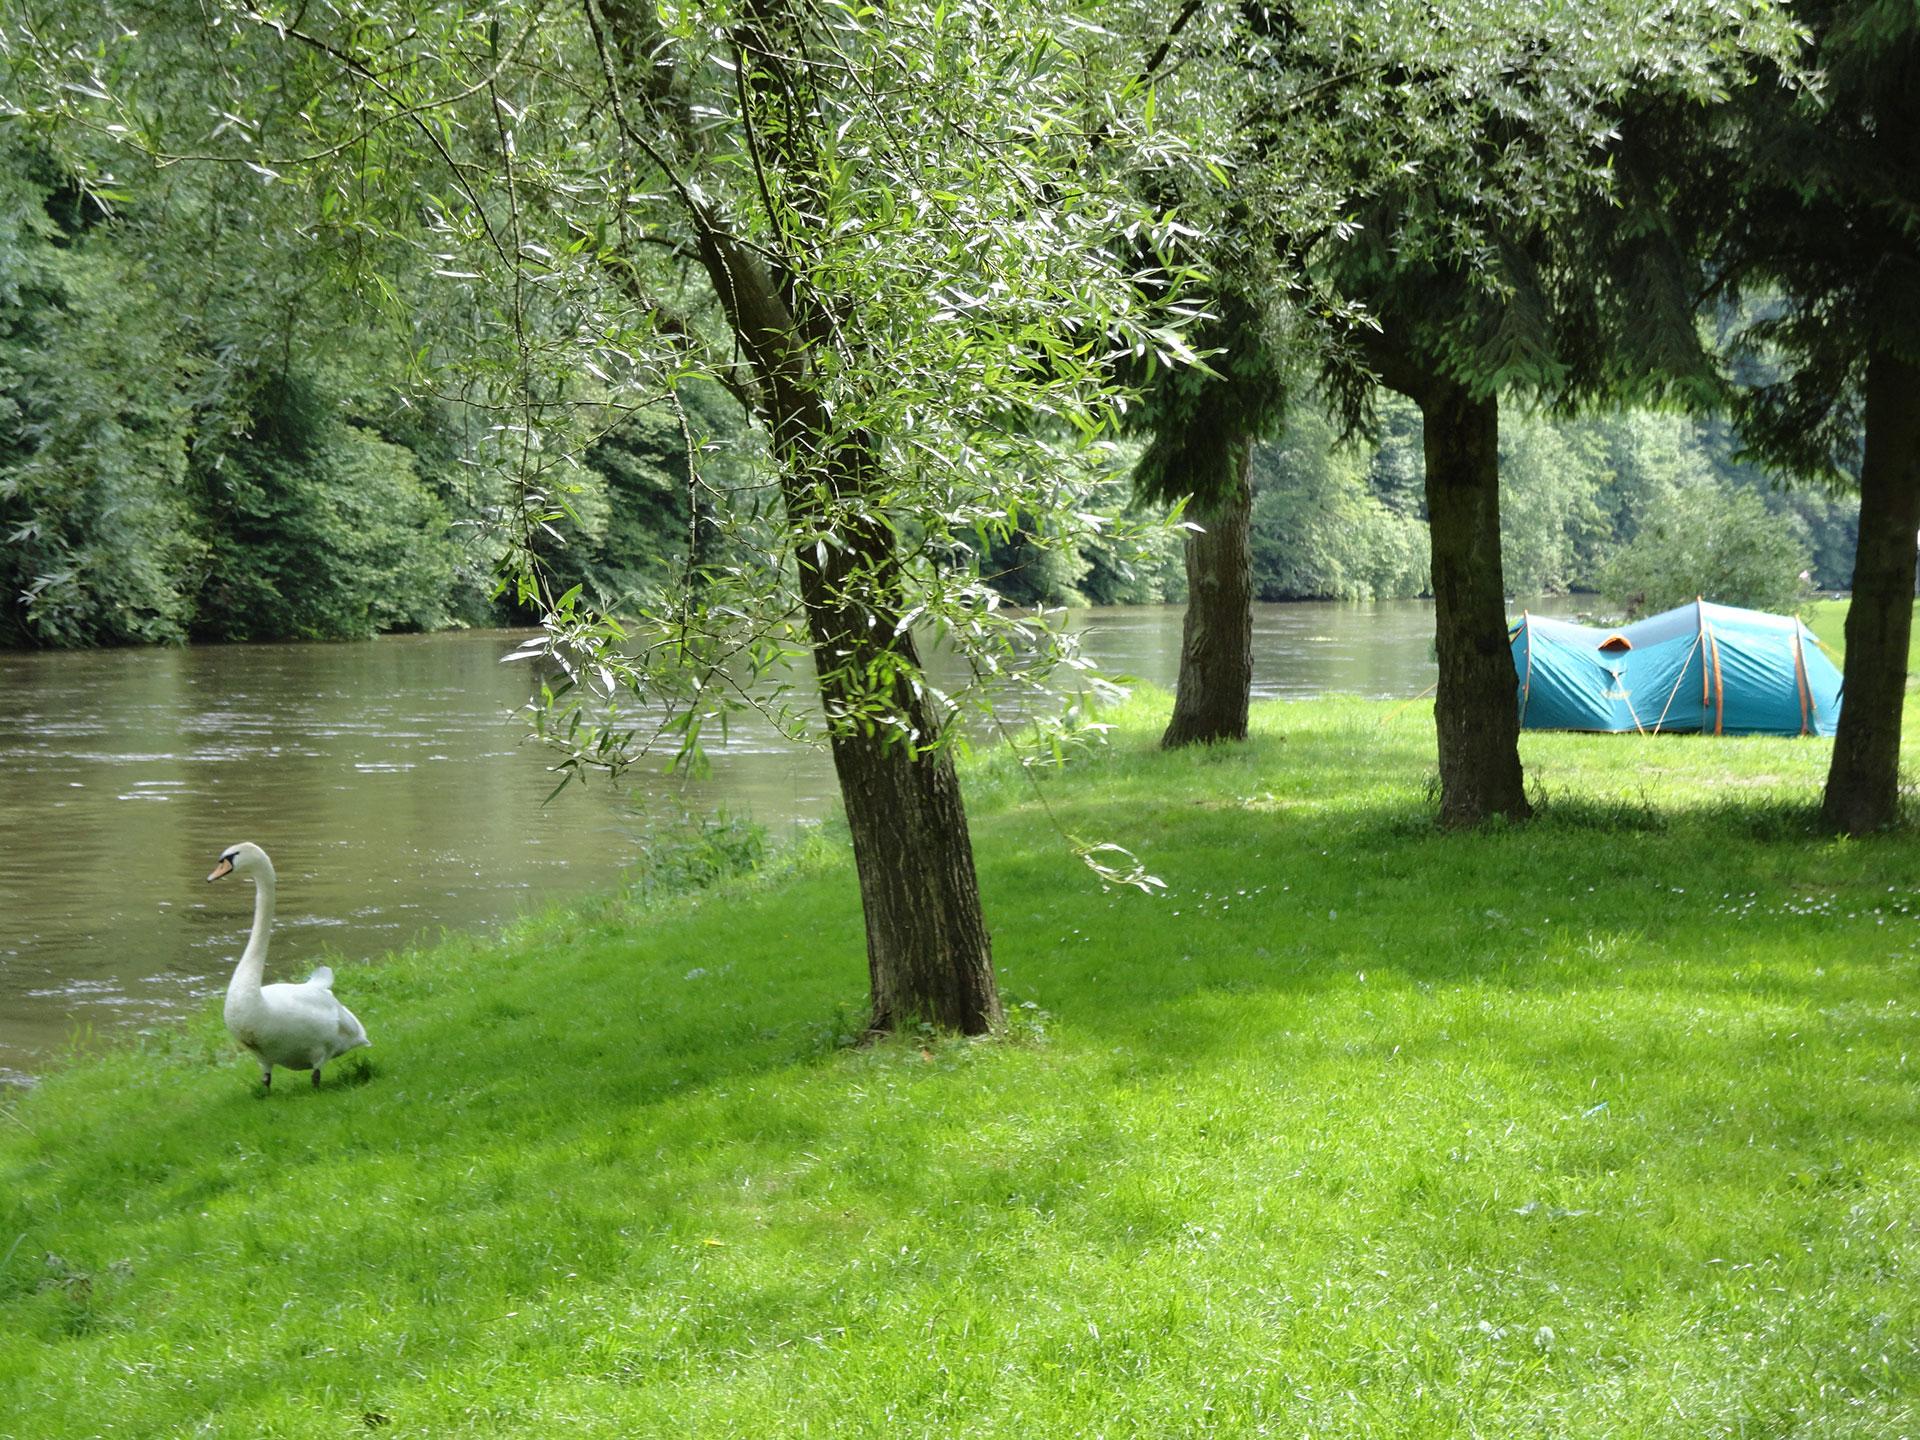 Camping - Ile de Faigneul - Poupehan - tente - caravane - camping-car